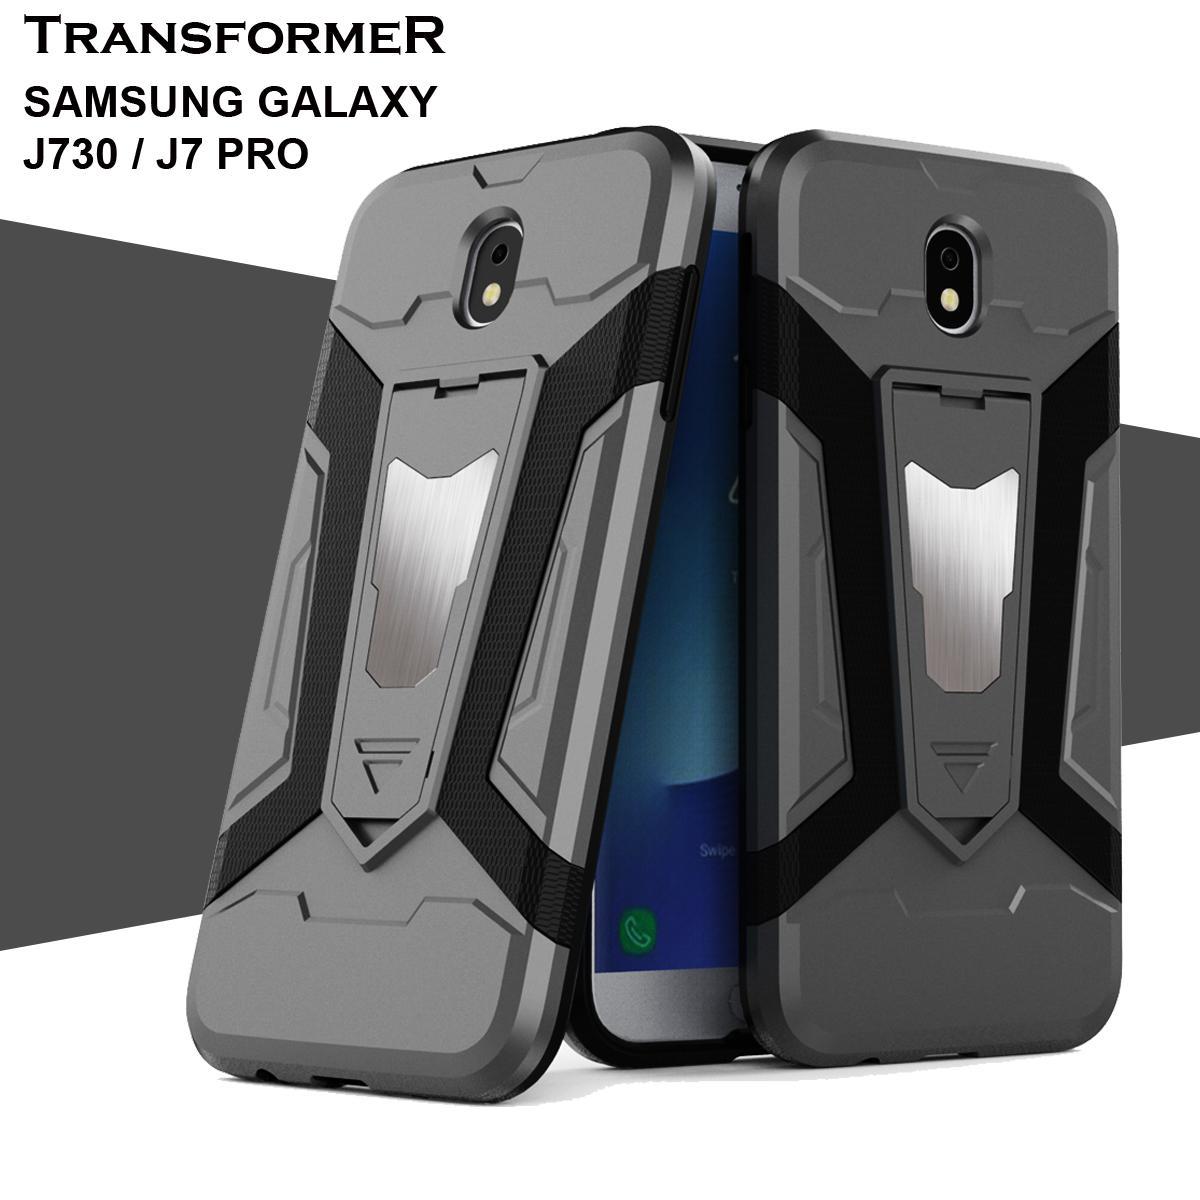 Case Iron Man for Samsung Galaxy J7 Pro / J730 / SAMSUNG J7 PRO Robot Transformer